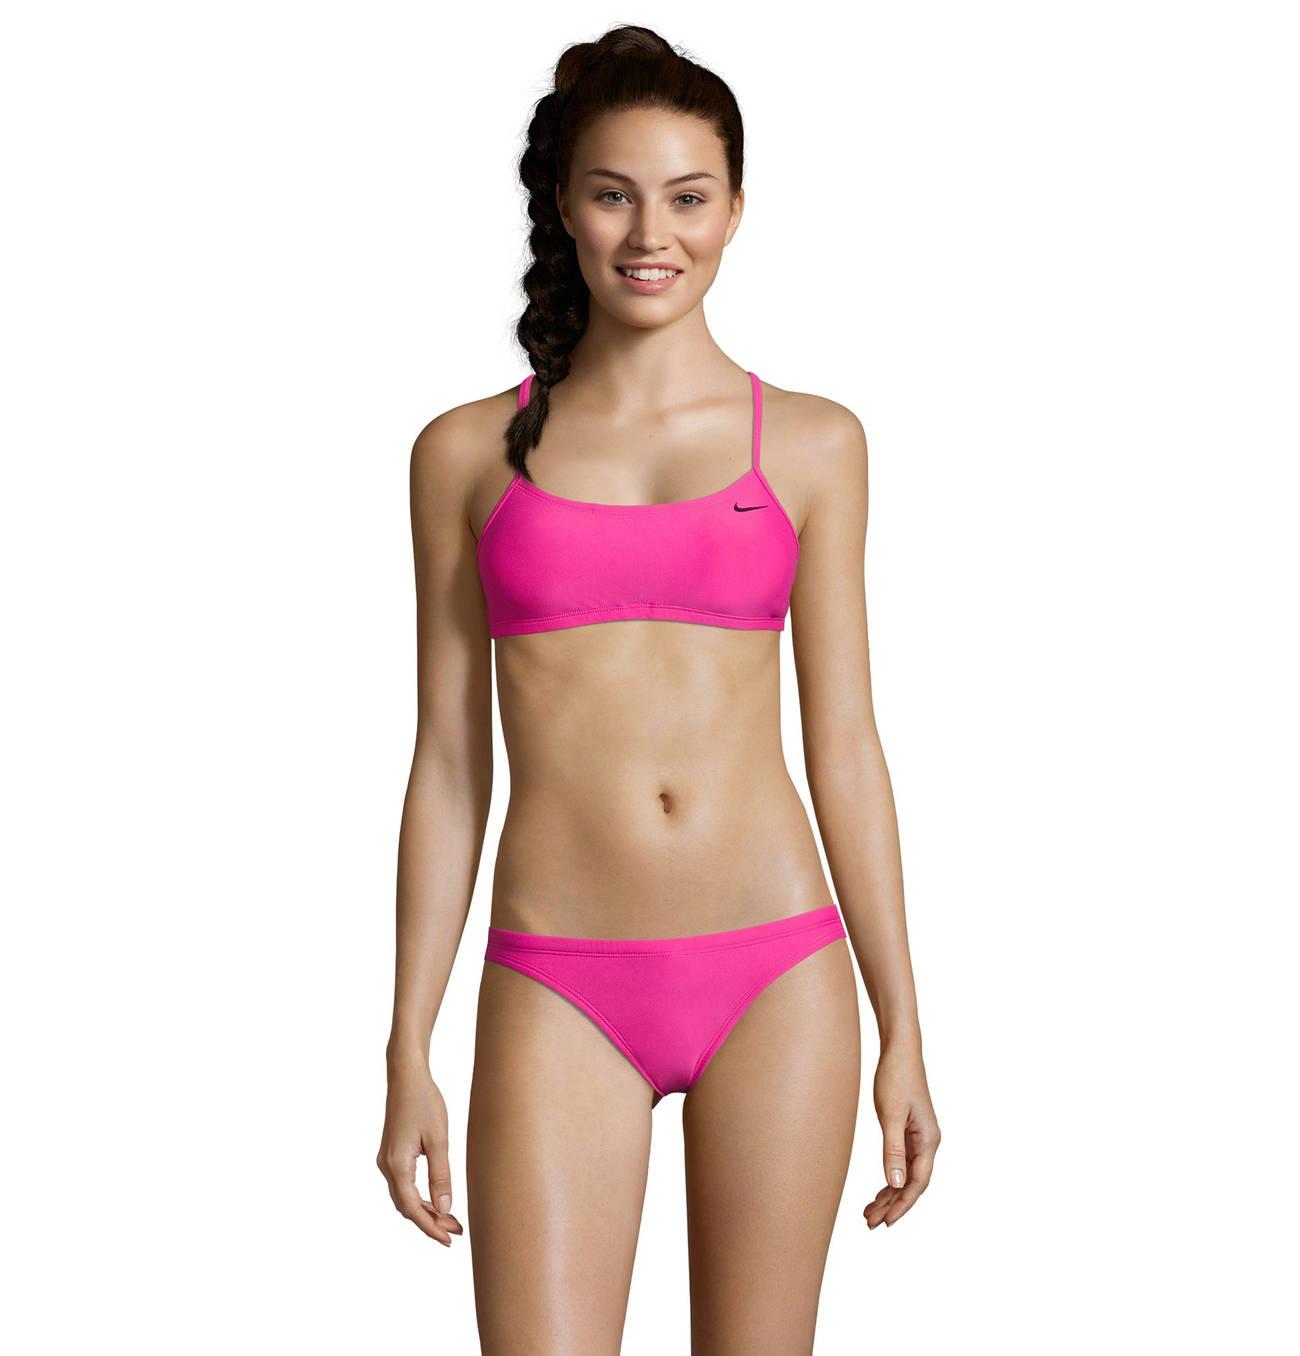 picked up multiple colors details for Bikini, Racerback, gepolsterte Cups, unifarben, für Damen in ...